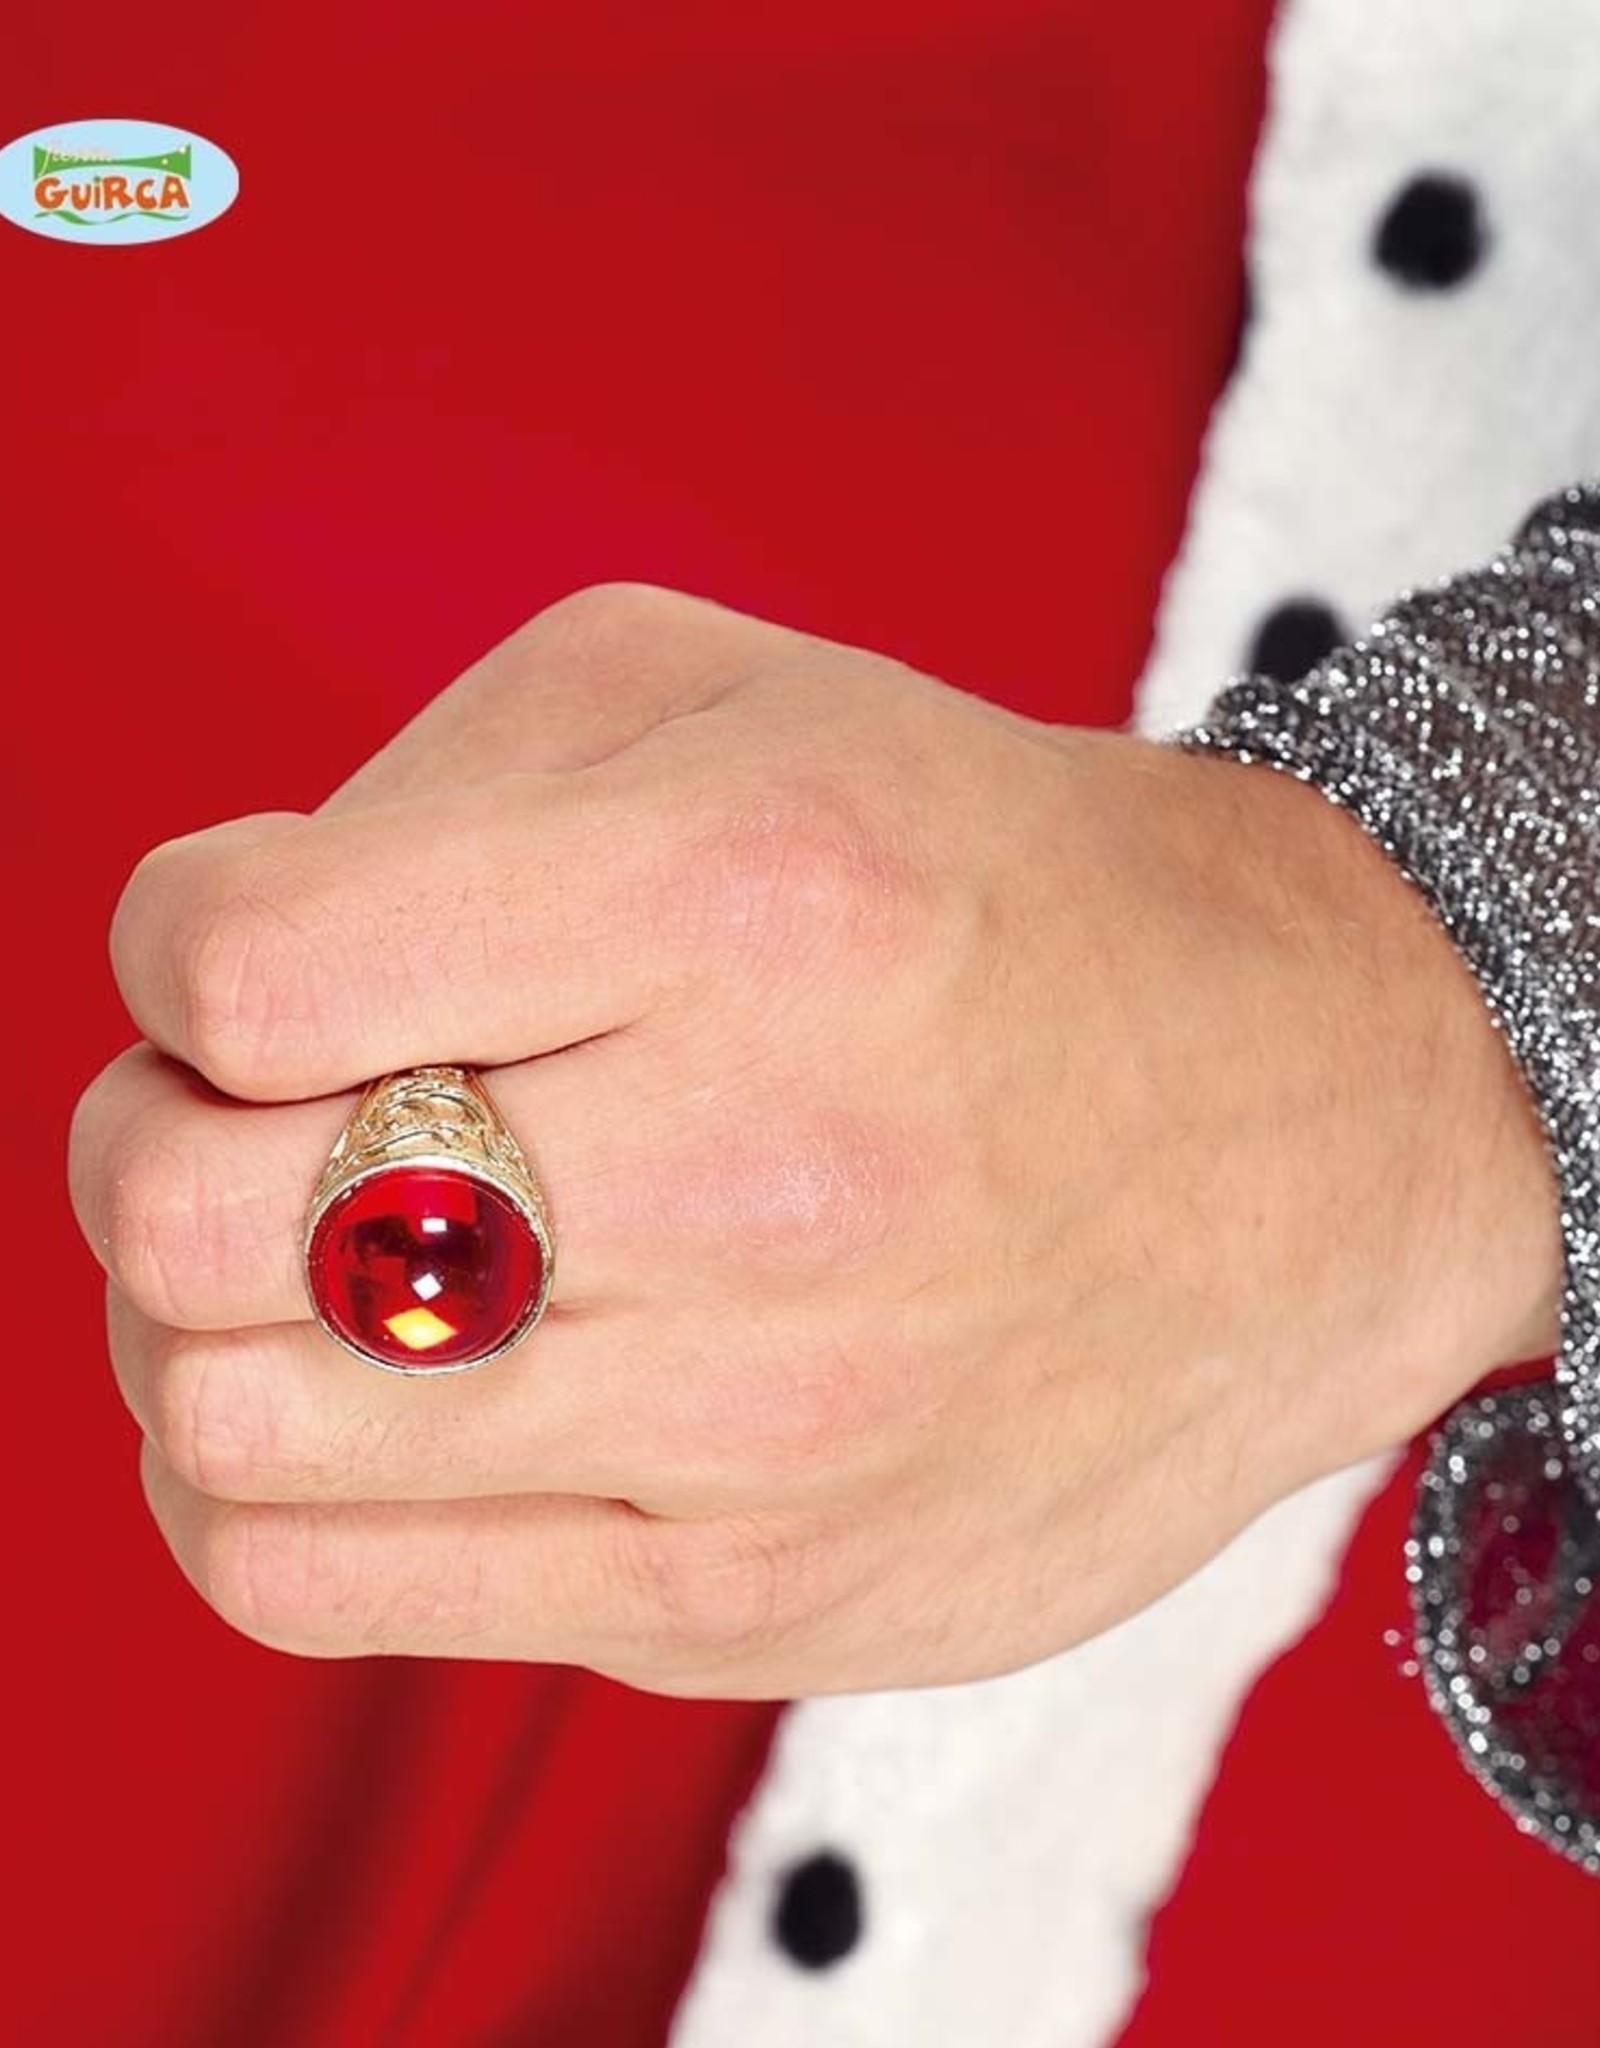 FIESTAS GUIRCA ring met rode steen